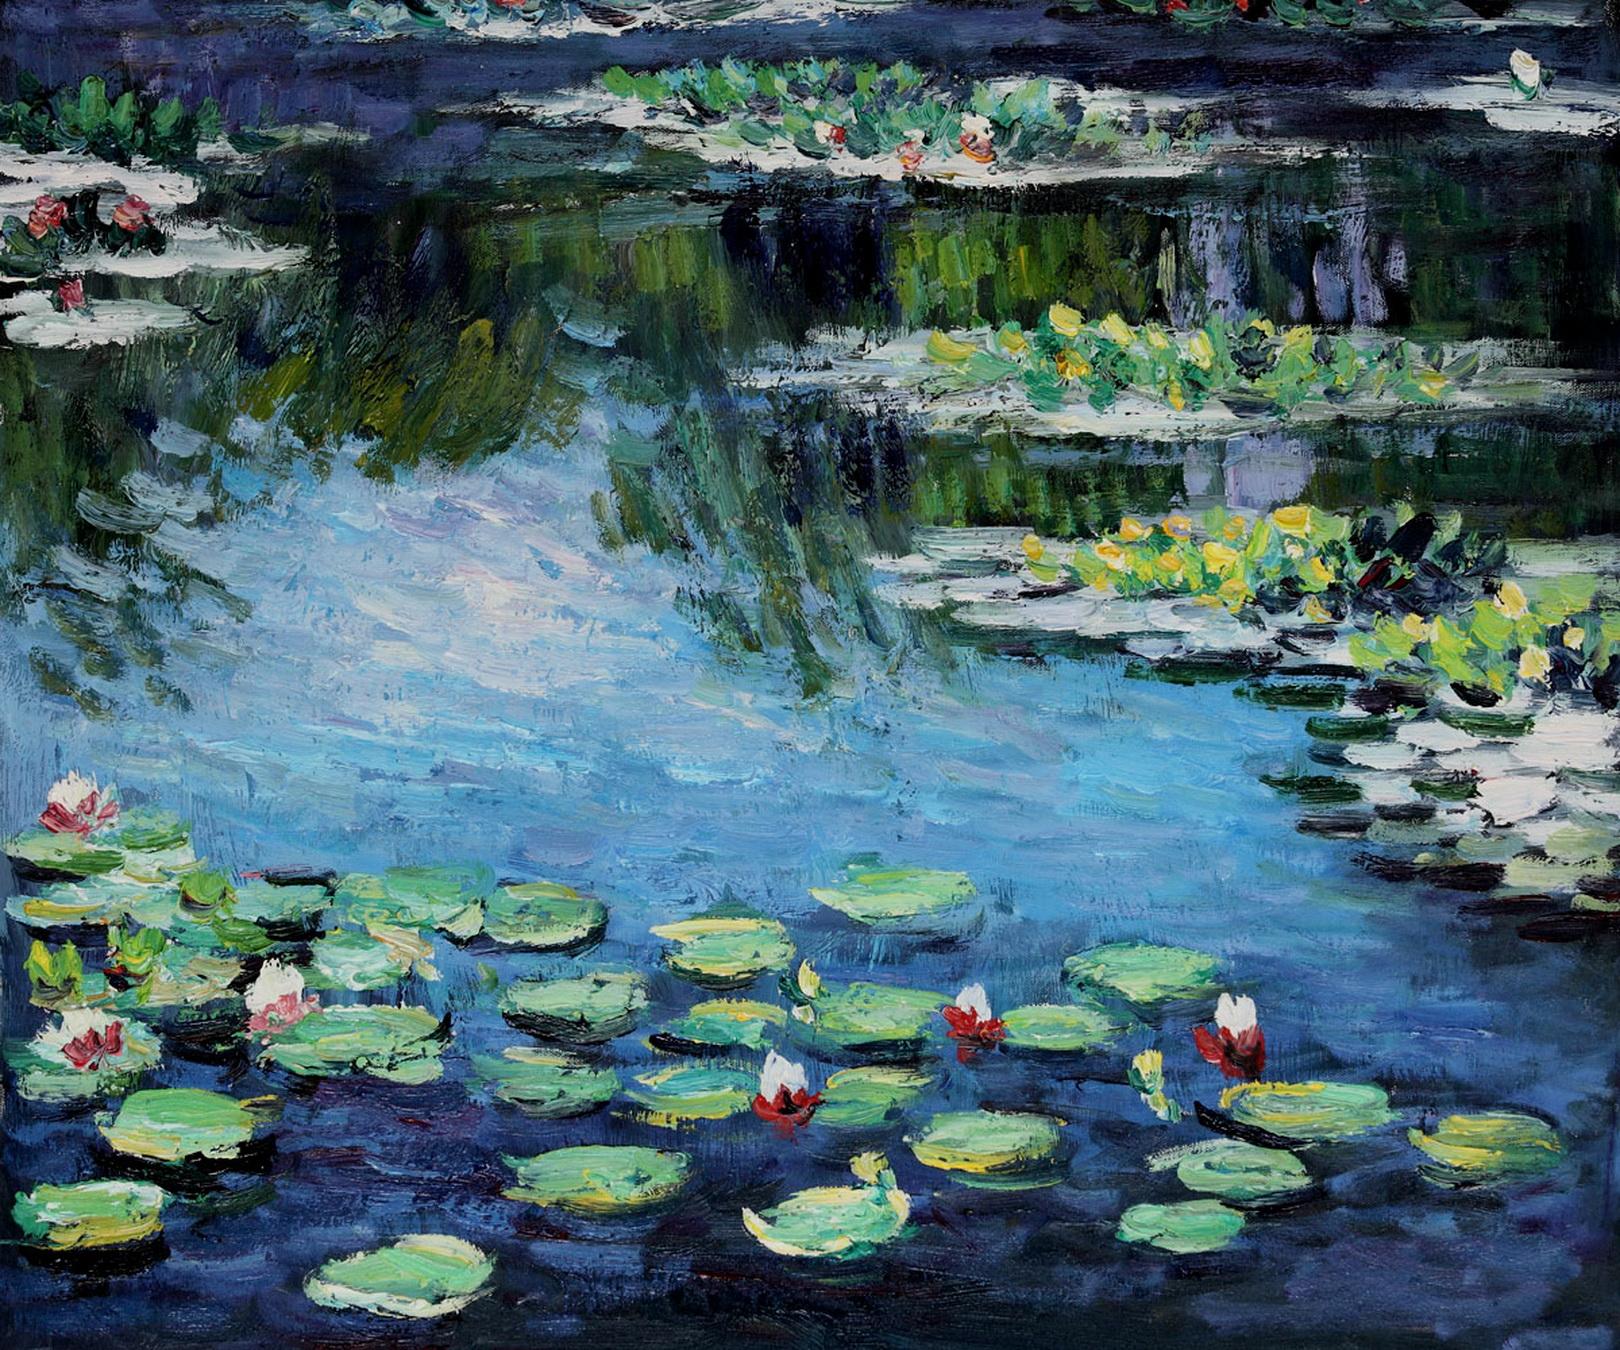 Monet lelies